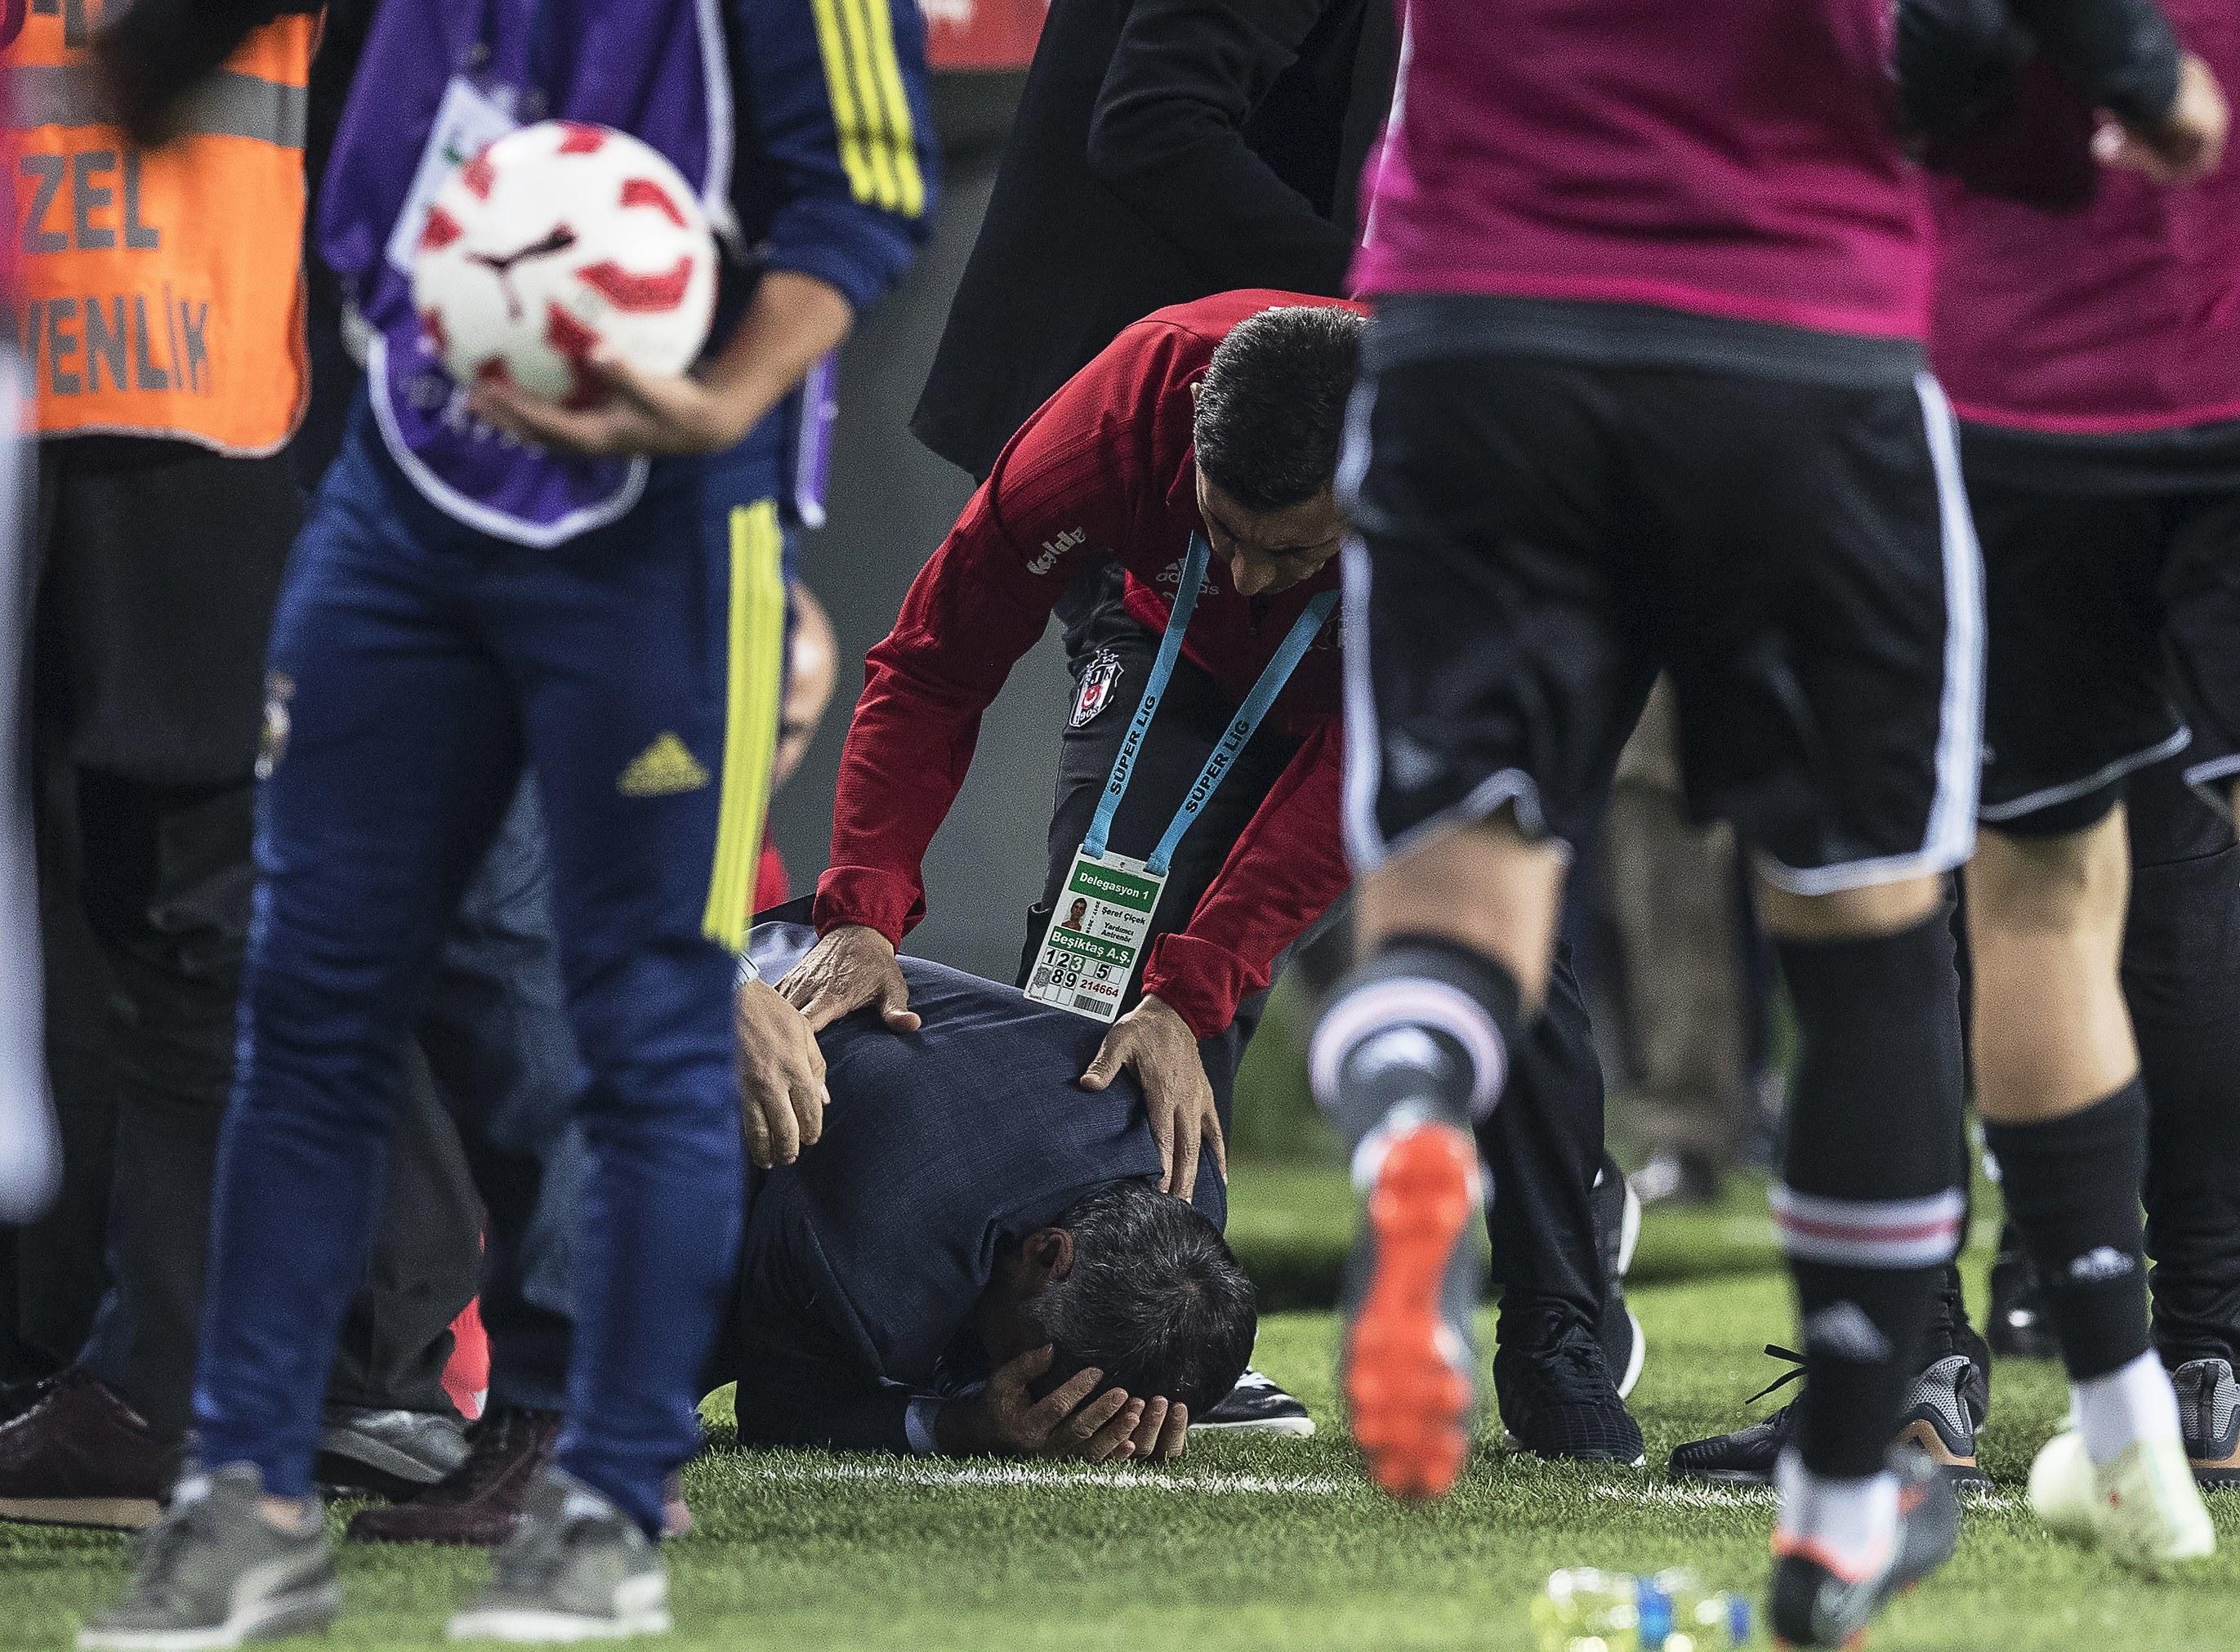 Treinador Senol Günes teve alta após incidentes no Fenerbahce-Besiktas